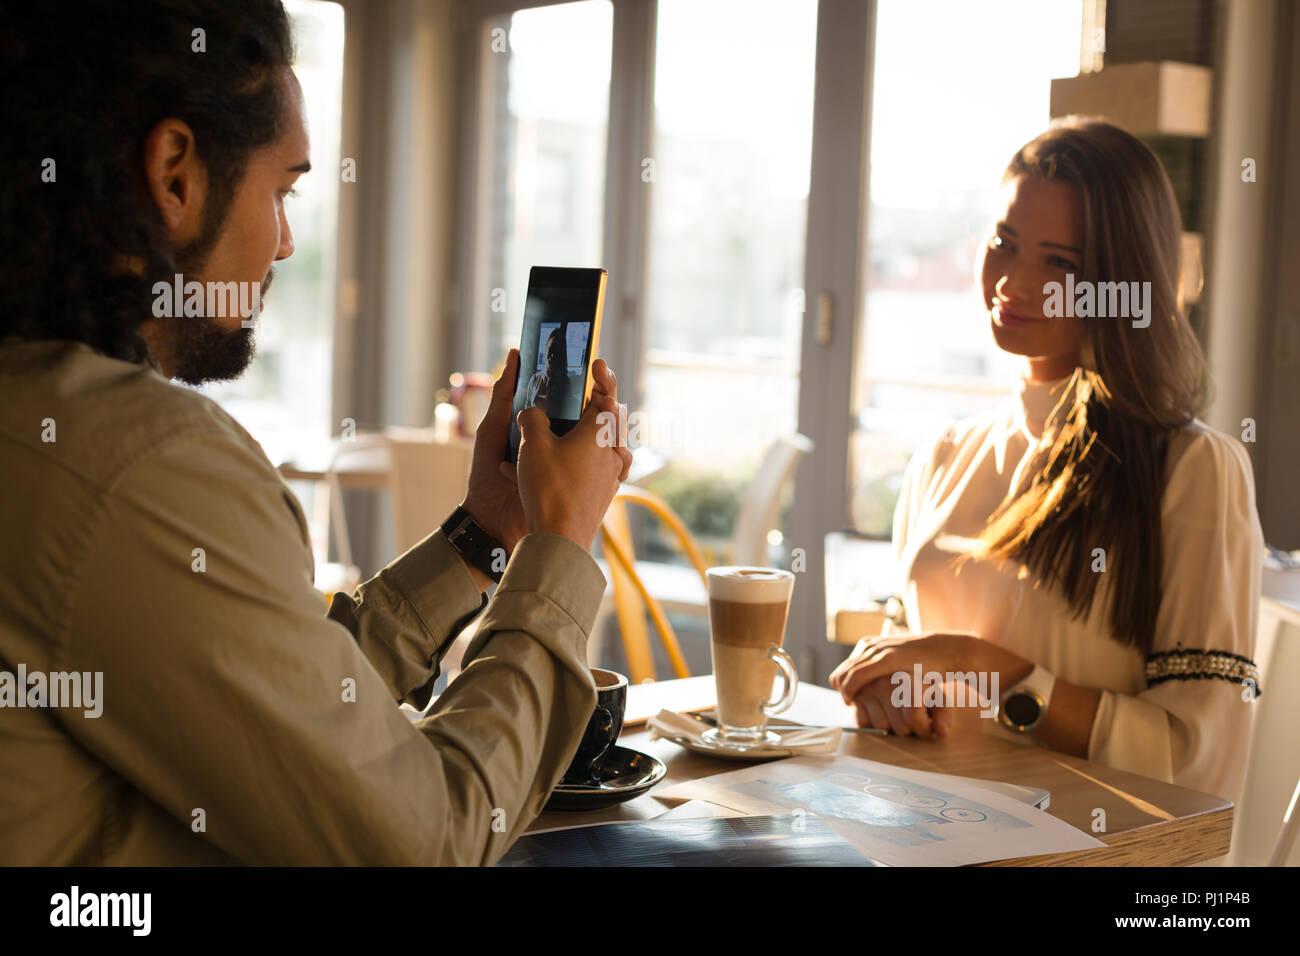 Man taking photo de son partenaire Photo Stock